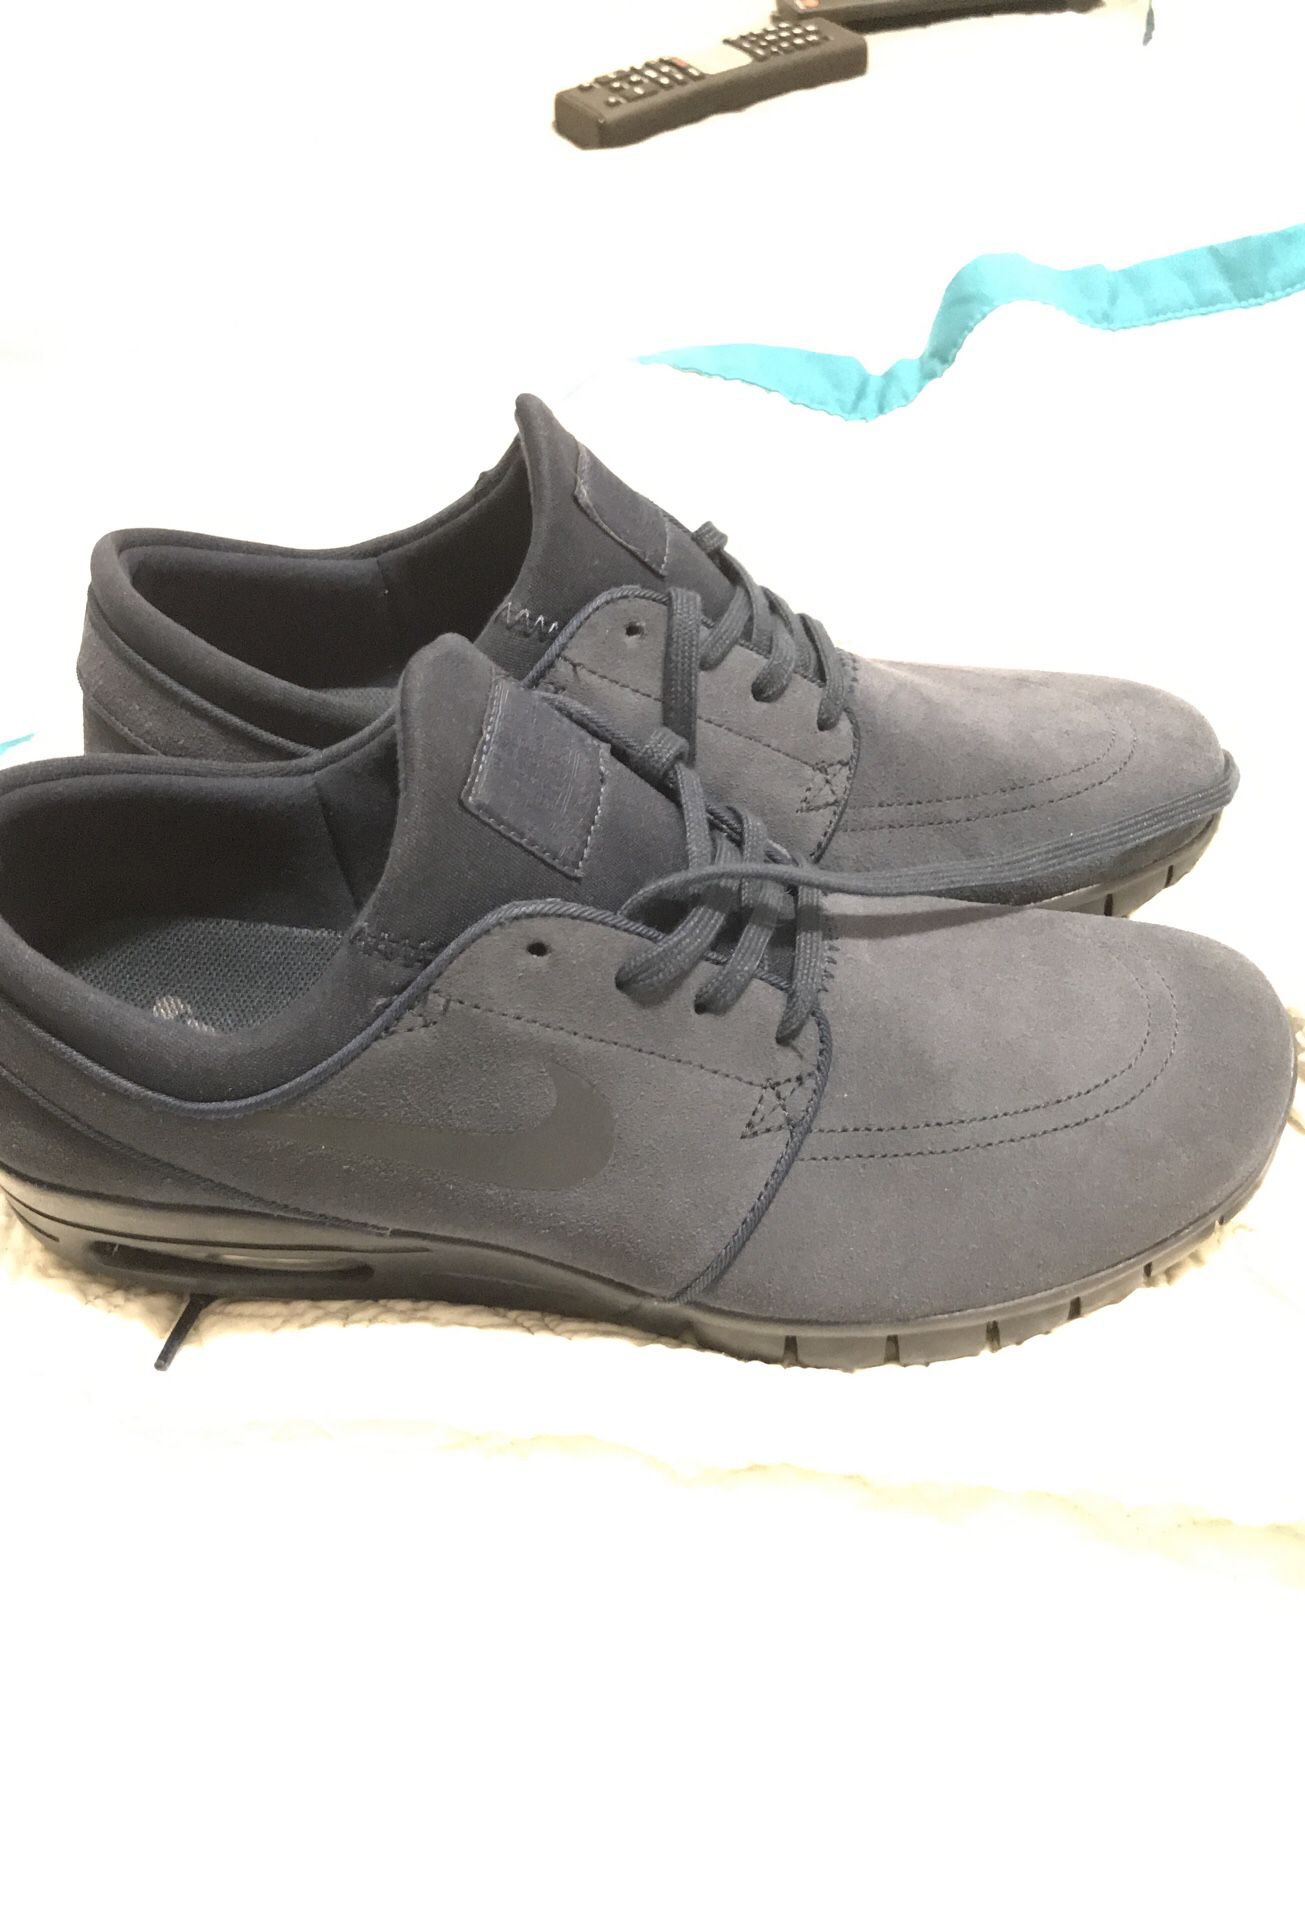 Dark blue Nike 10.5